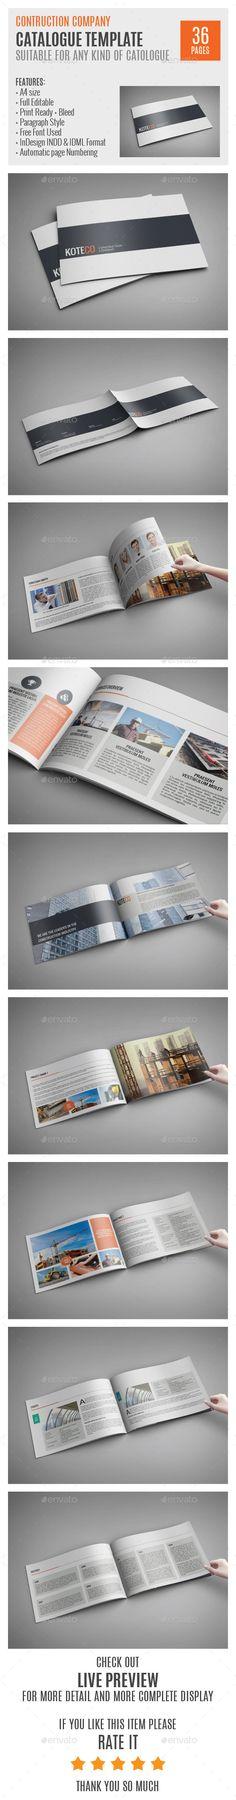 Company Profile Template Business Profile Pinterest Company - professional business profile template